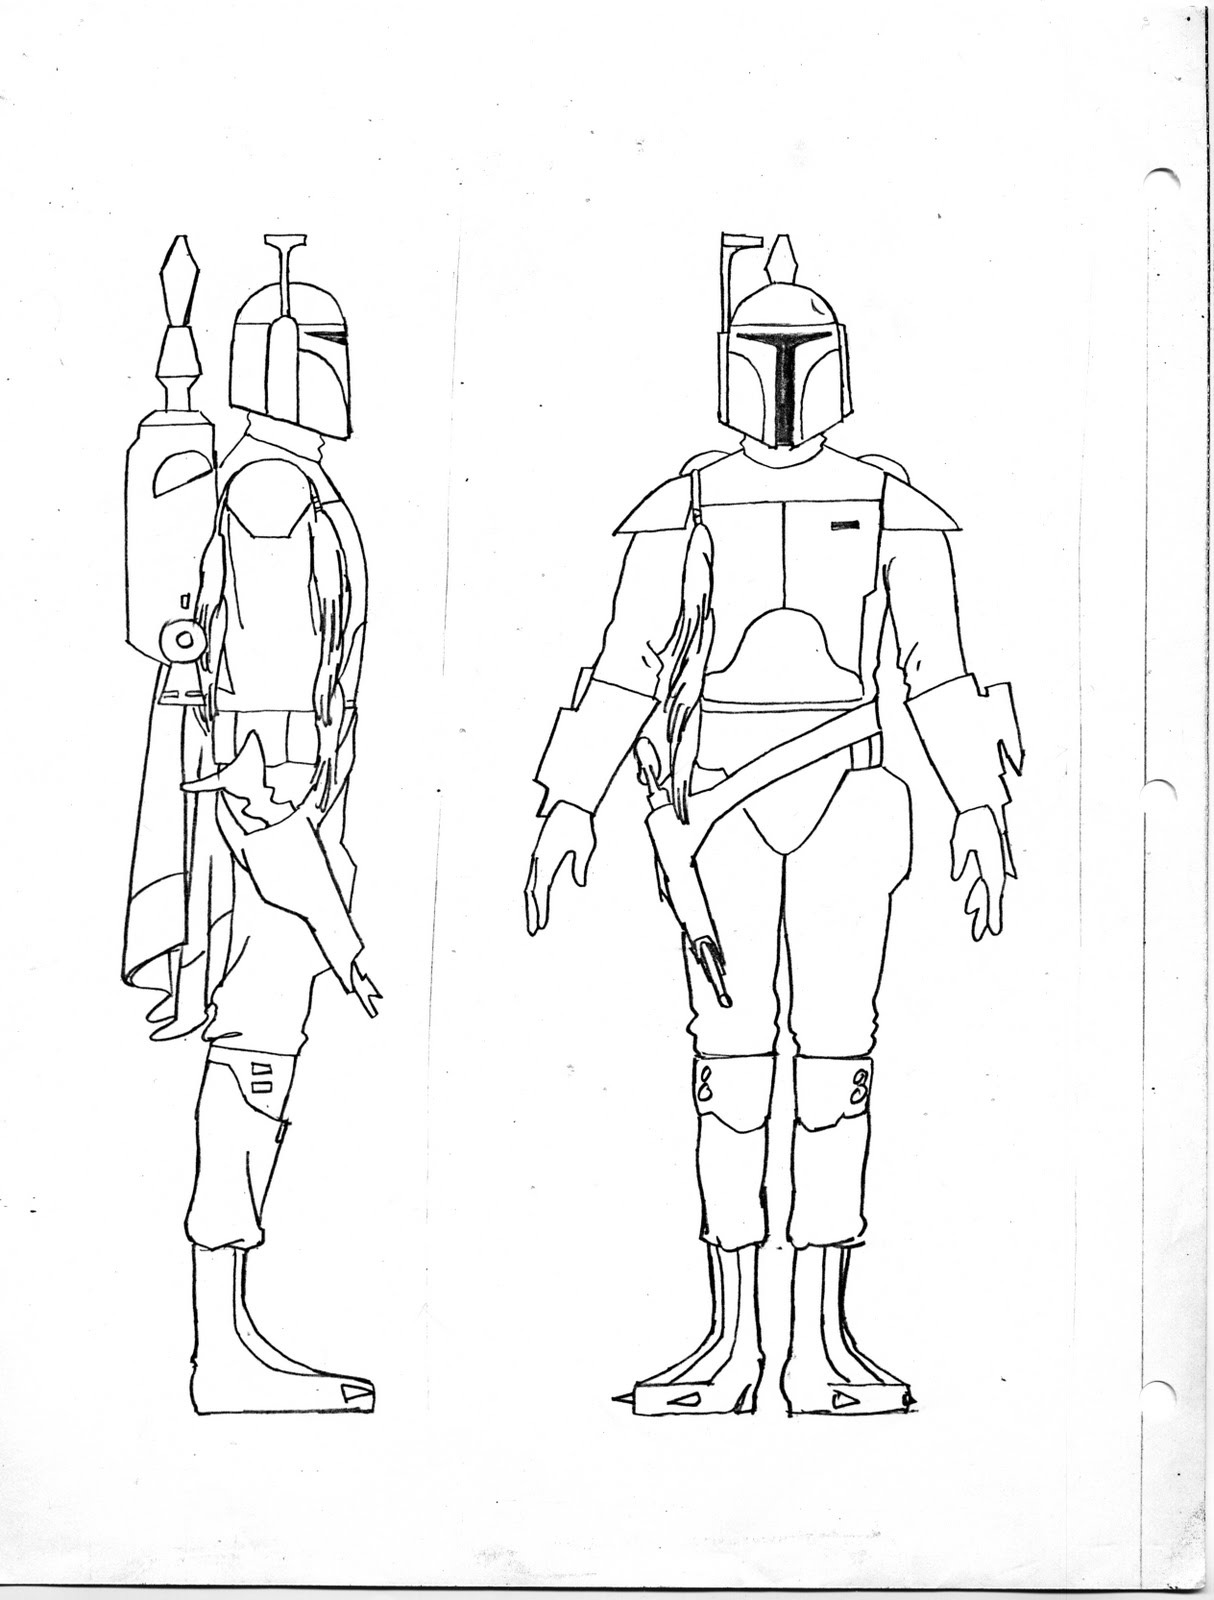 John The Animator Guy Boba Fett Amp The Star Wars Holiday